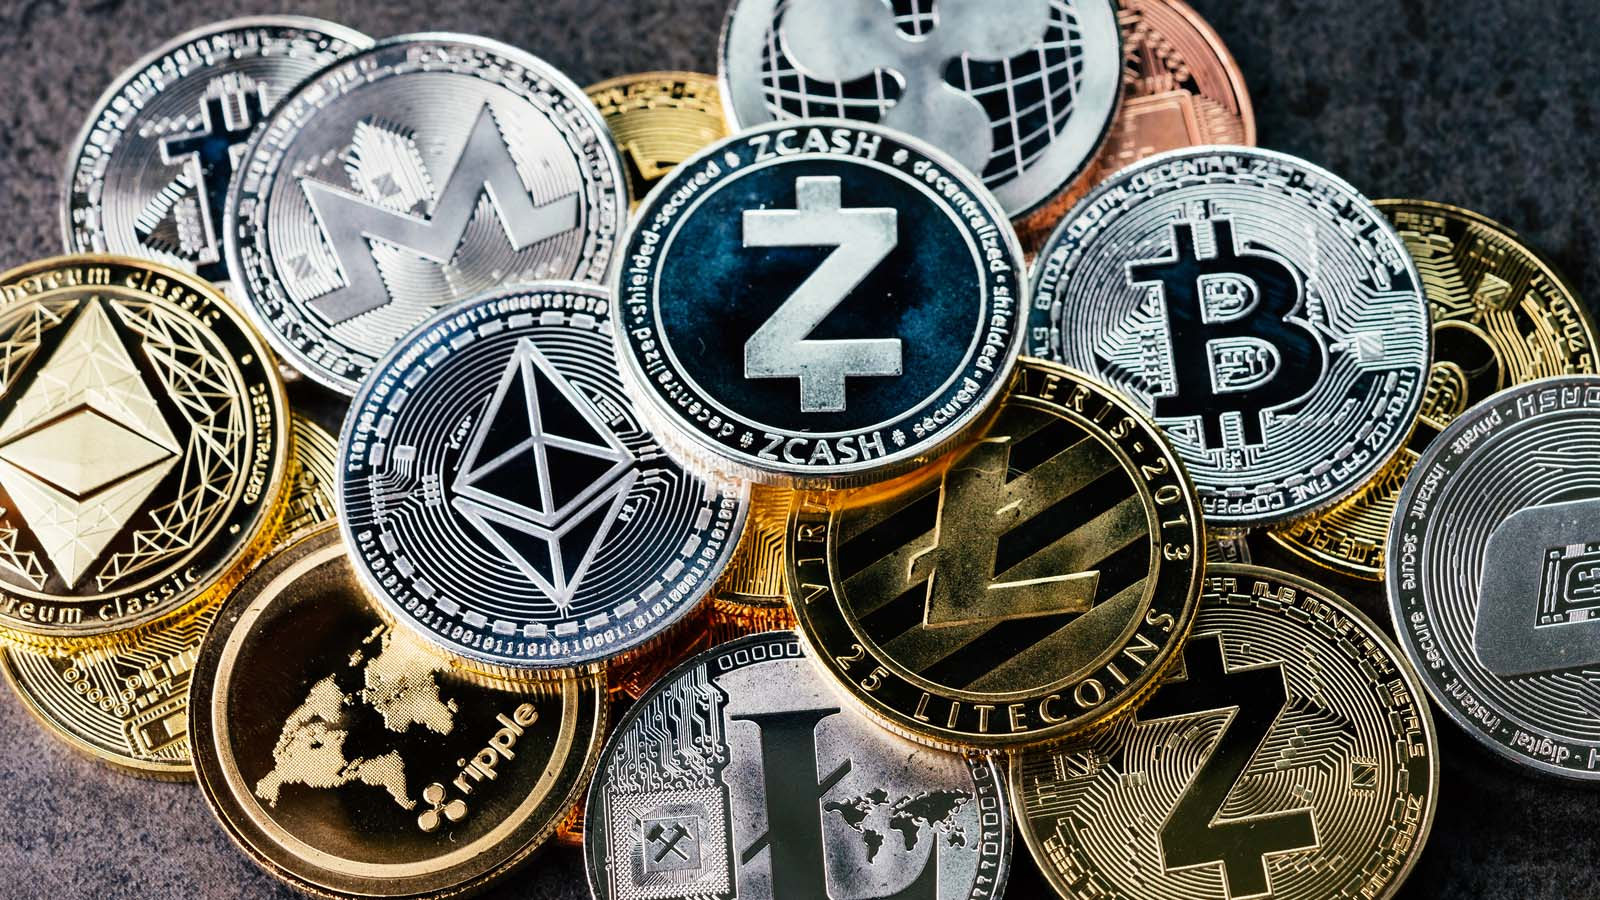 cryptocurrencies - 7 Explosive Cryptocurrencies to Buy for the Bitcoin Halvening